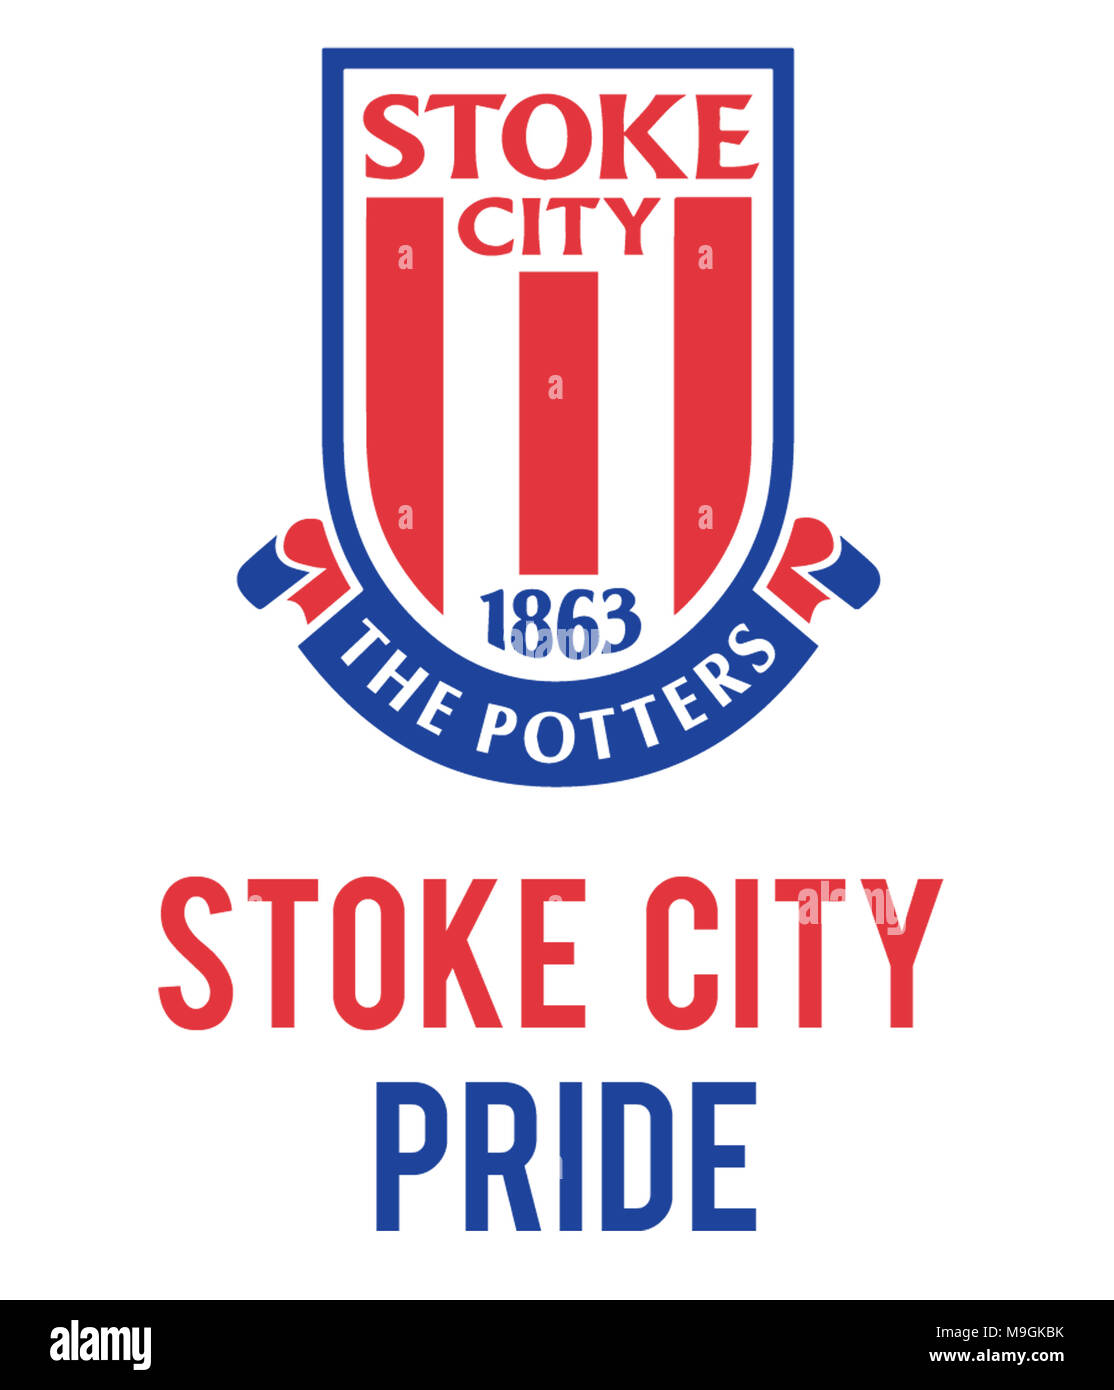 Stoke City Pride - Stock Image